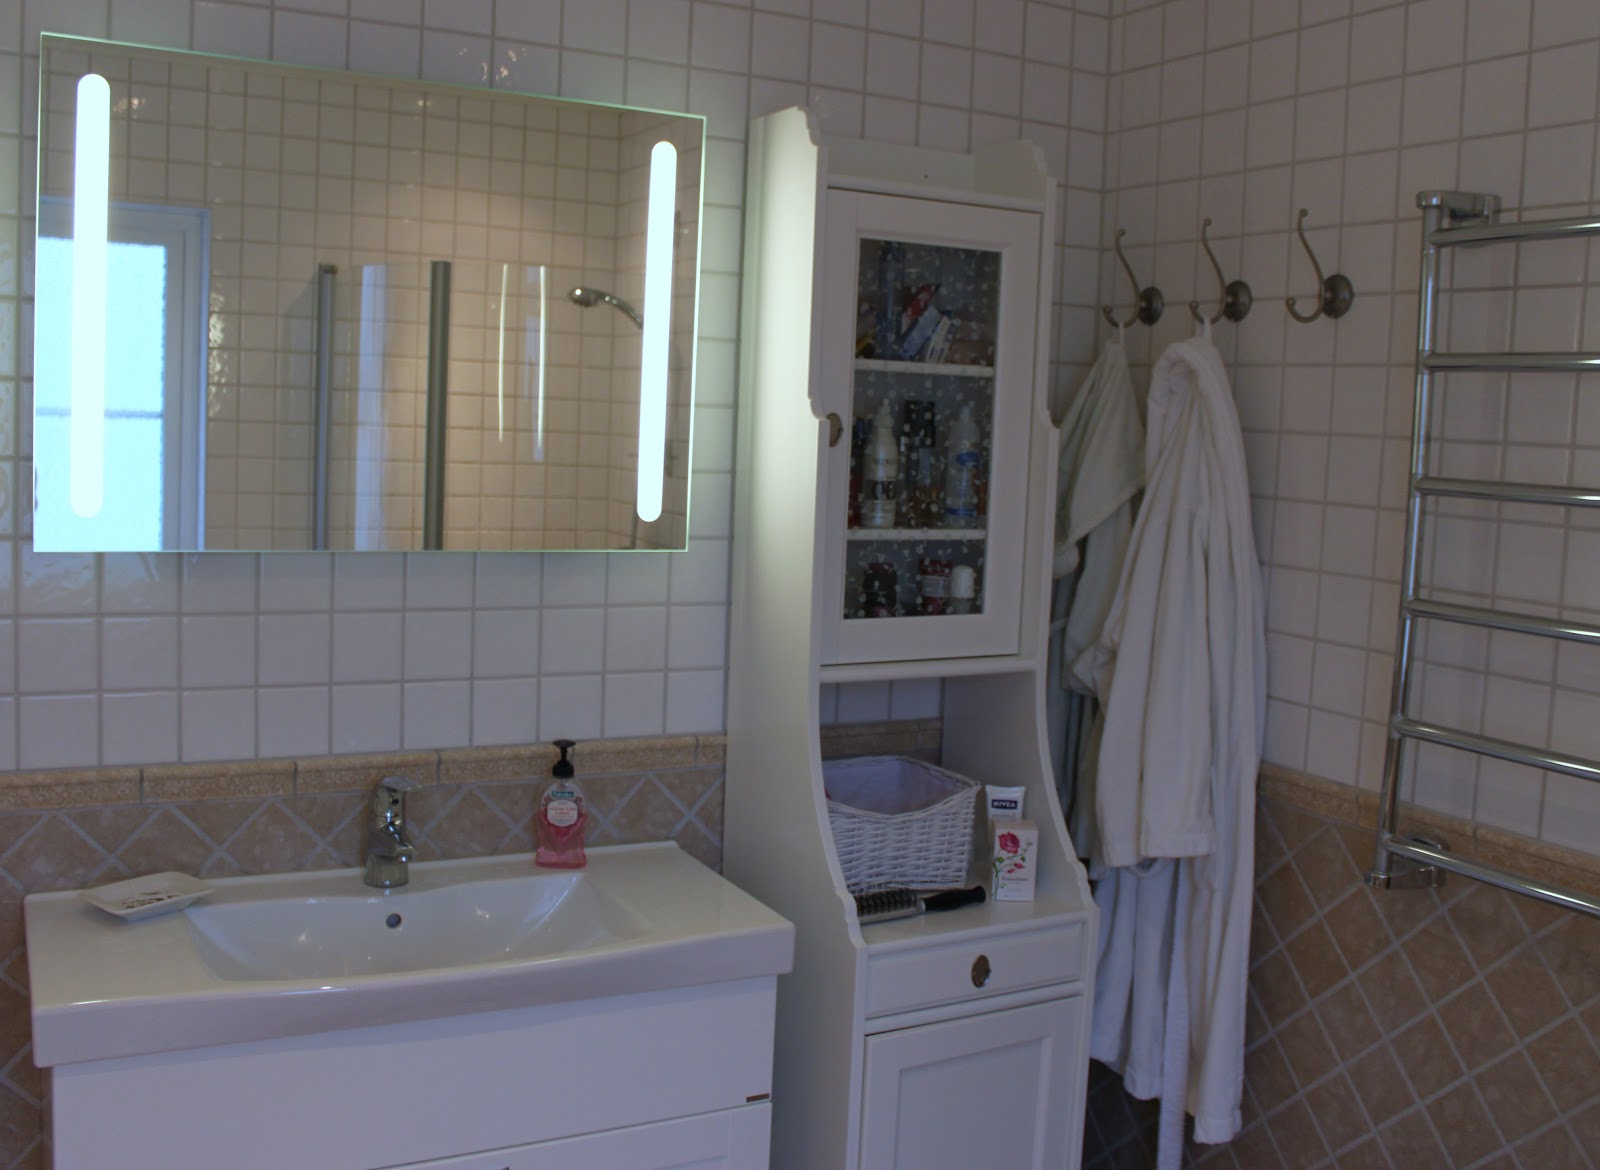 Carinashousebythesea: badrumsskåp